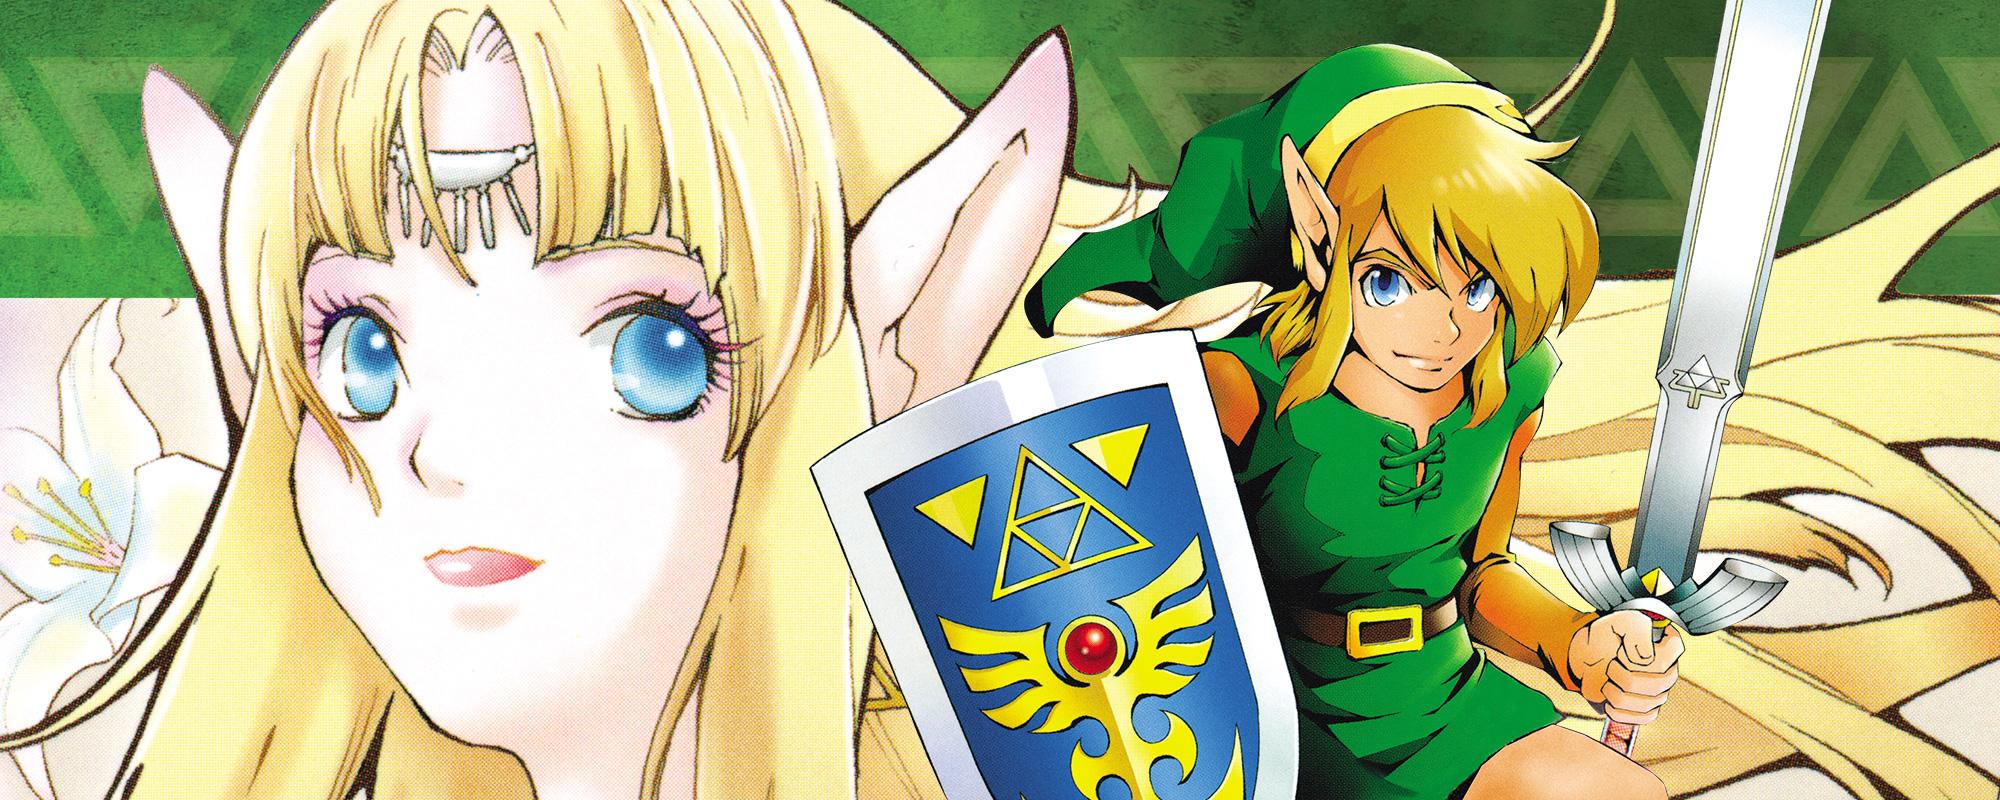 Zelda manga